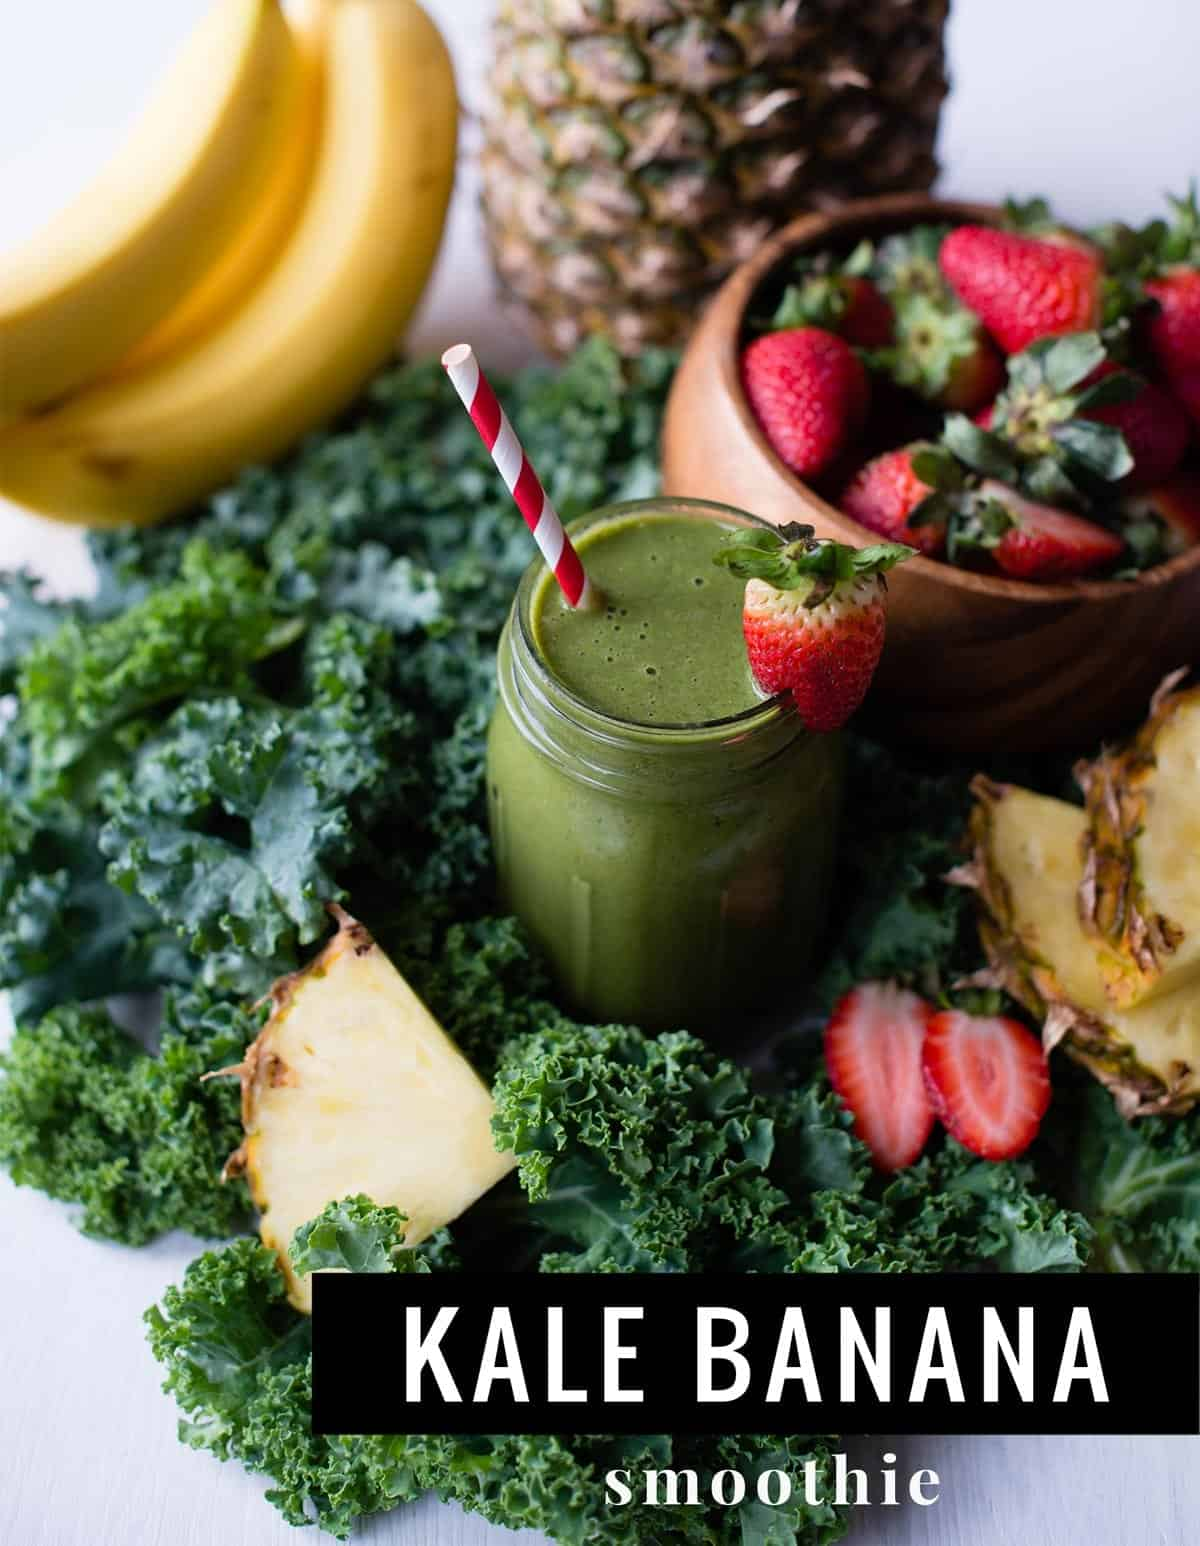 Kale Banana Smoothie | SimpleGreenSmoothies.com #plantbased #vegan #greensmoothie #kalesmoothie